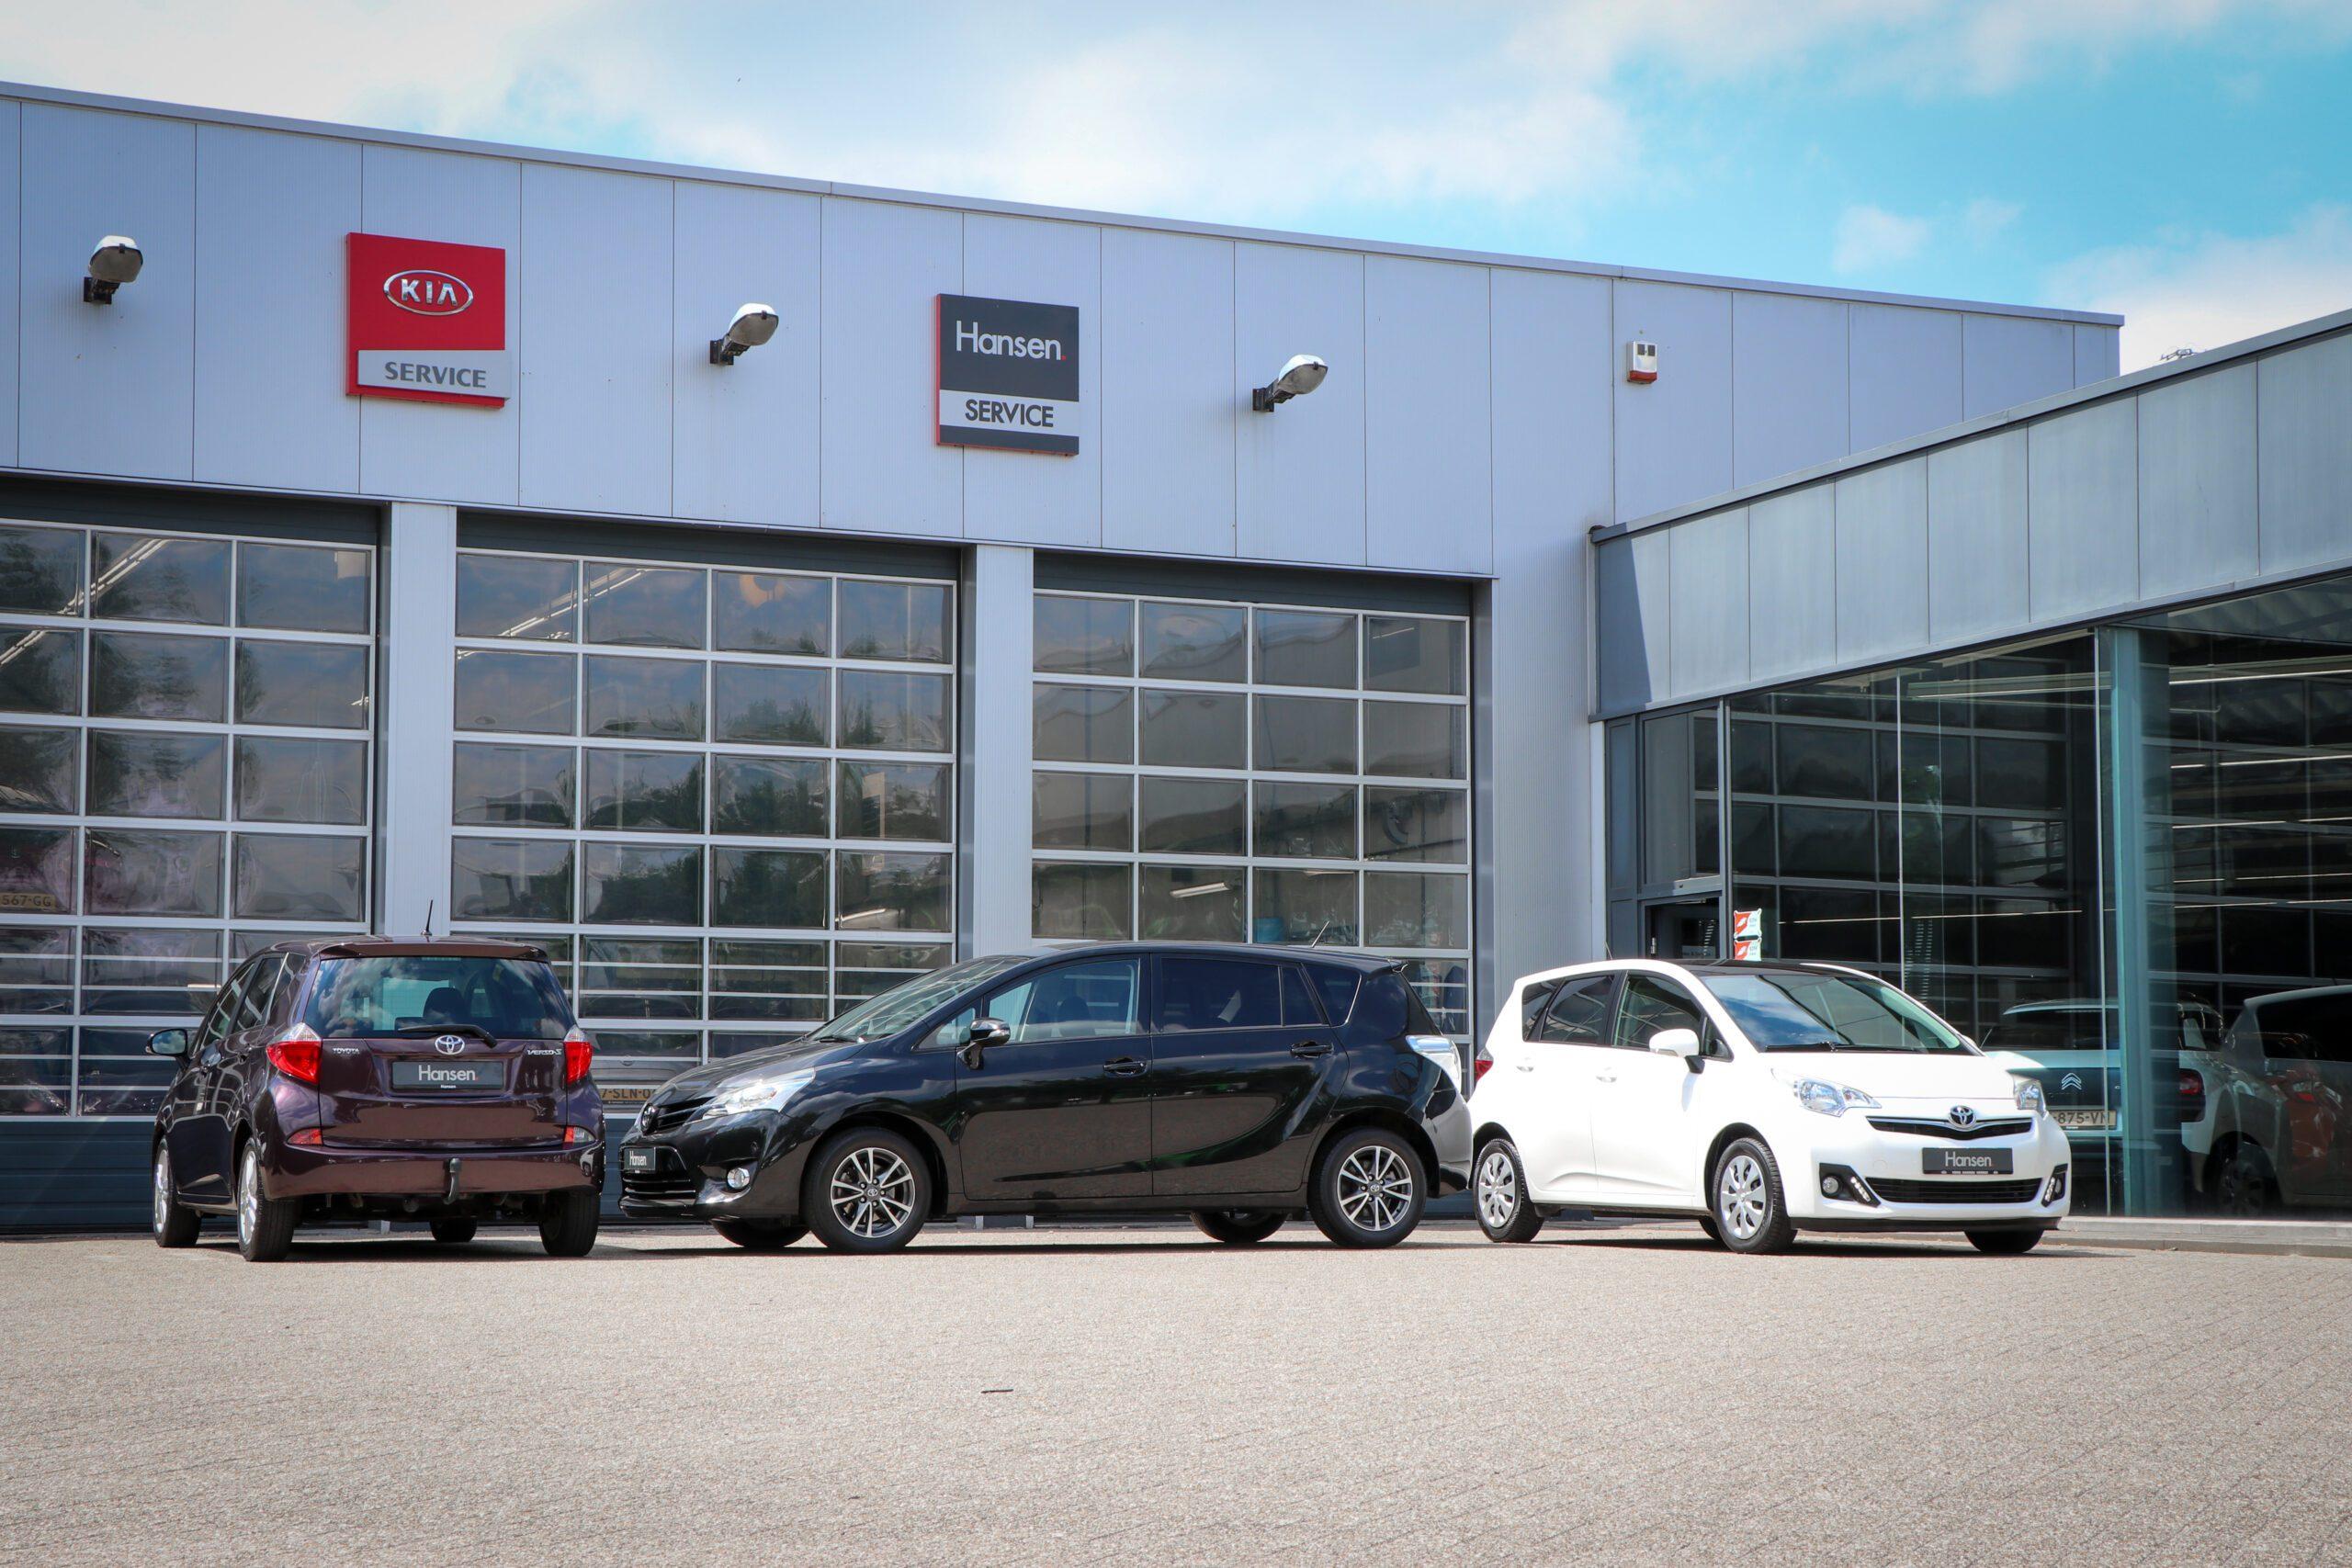 Toyota Verso-S wit paars zwart